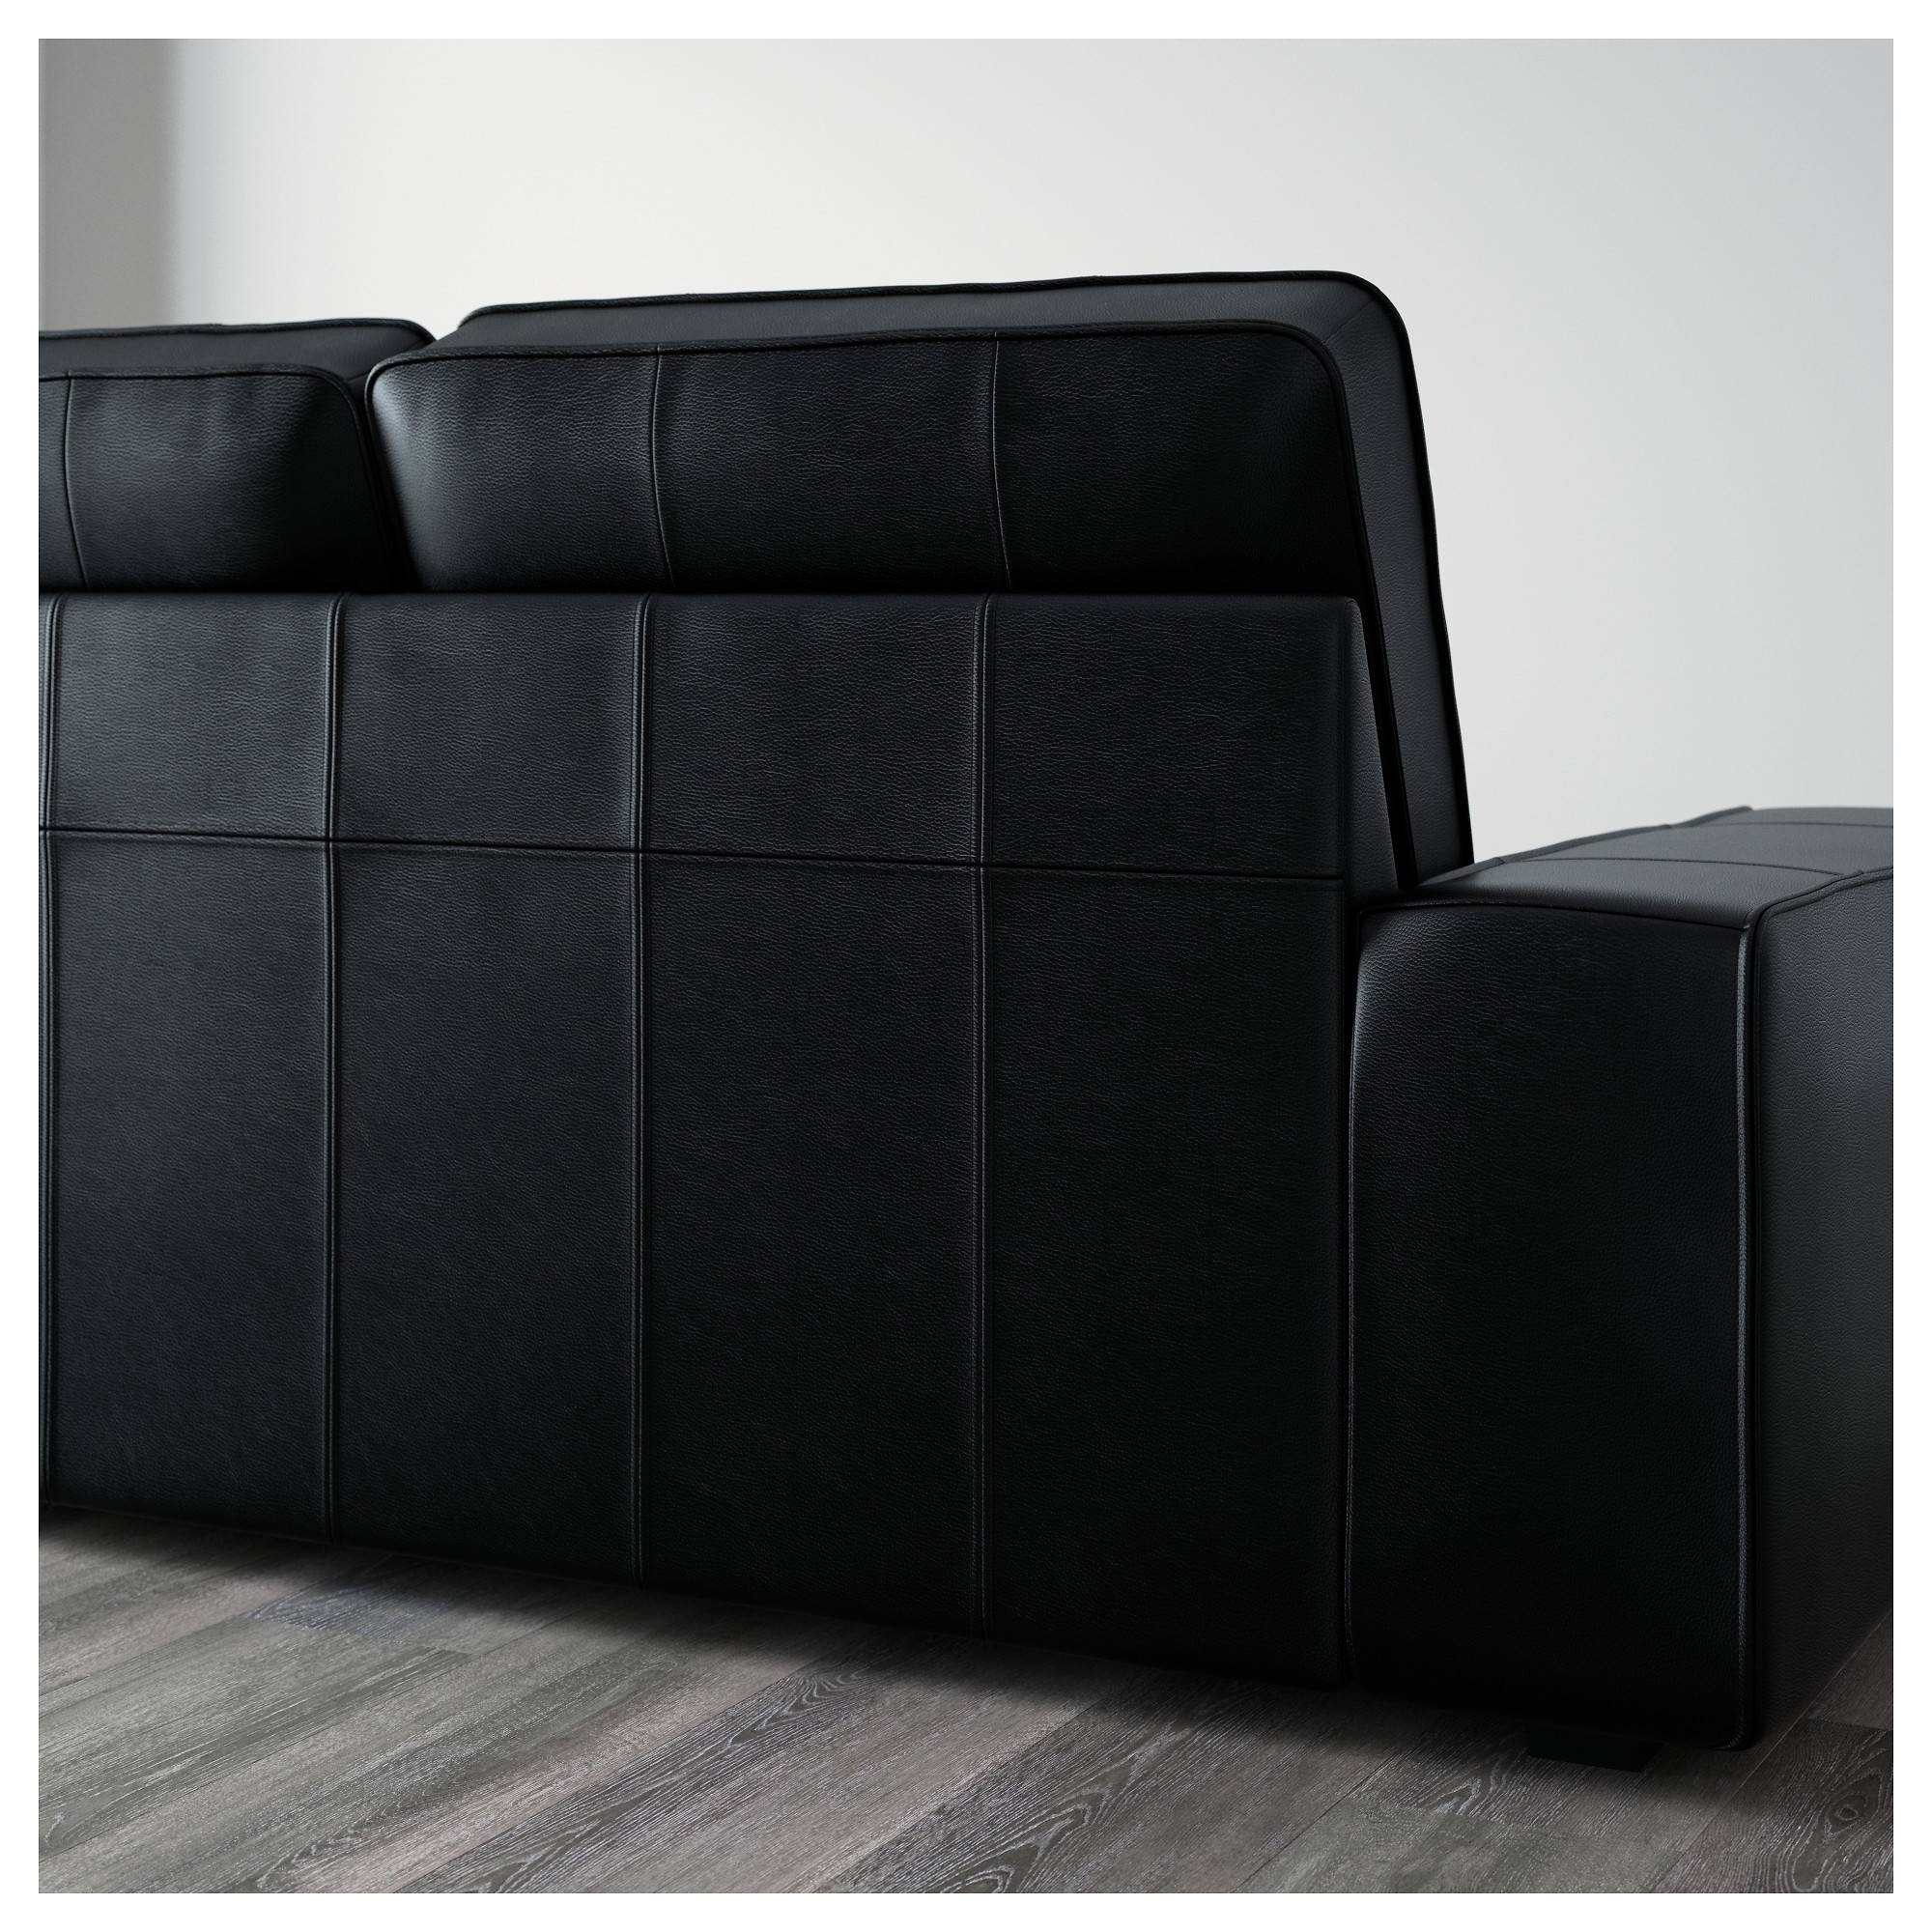 Kivik Sofa, U-Shaped 8-Seater/grann/bomstad Black - Ikea regarding Ikea Two Seater Sofas (Image 12 of 30)